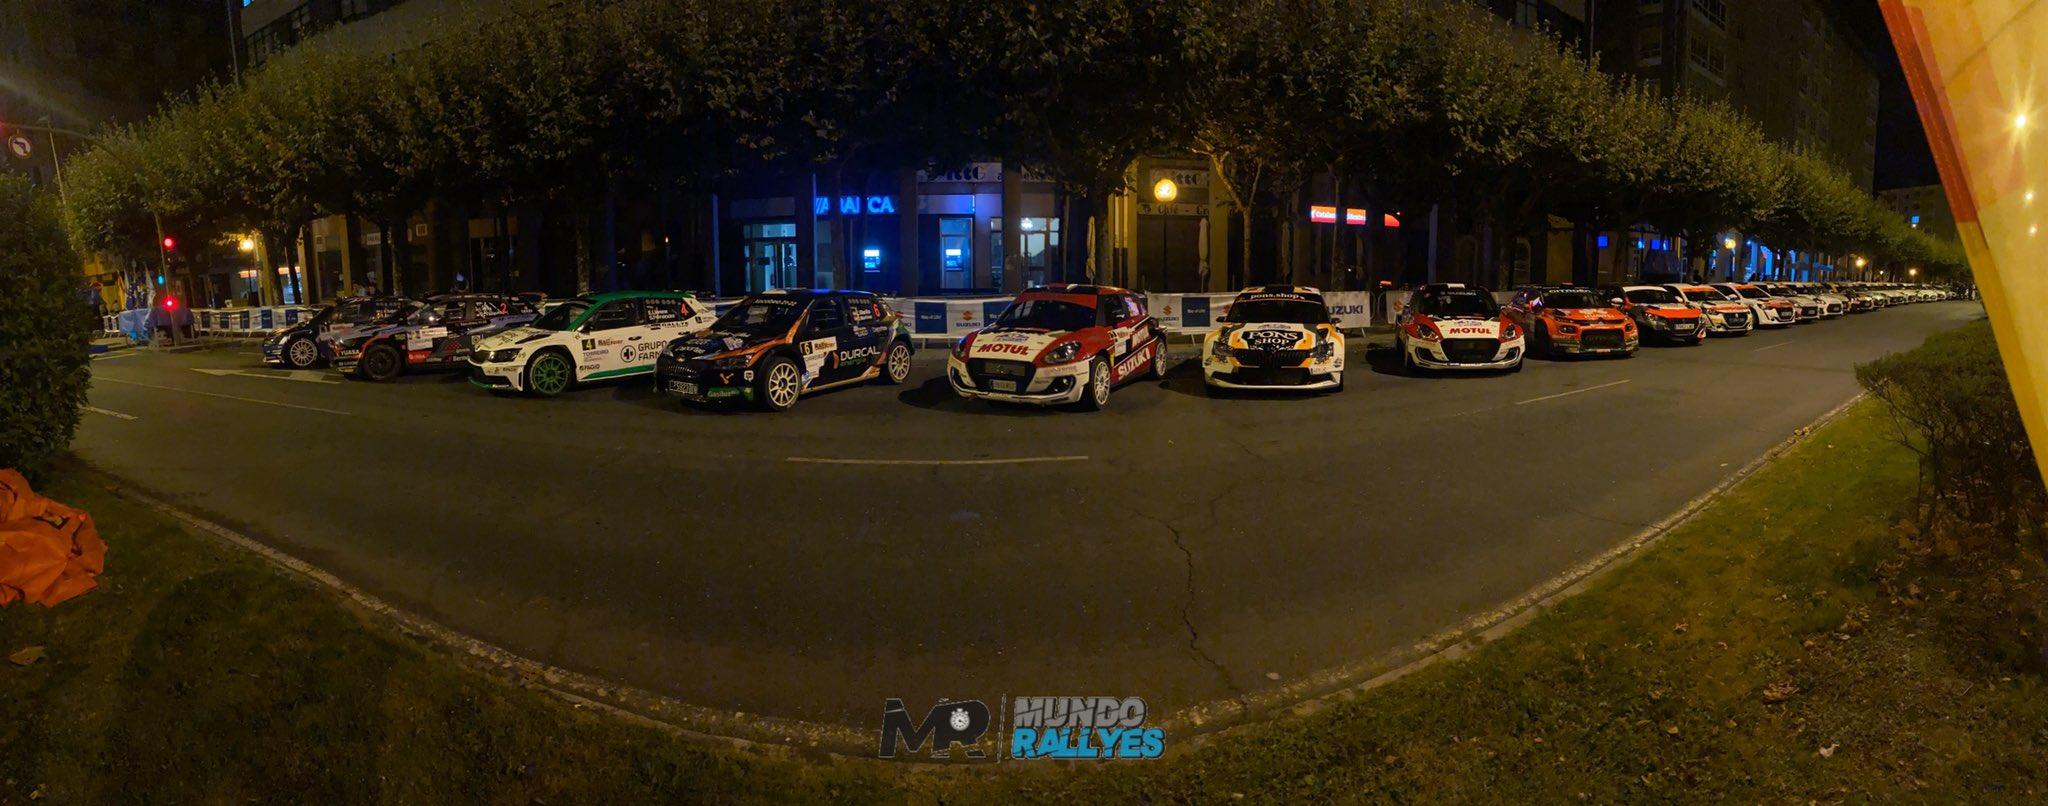 SCER + TER: 52º Rallye de Ferrol - Suzuki [20-21 Agosto] - Página 2 E9RKJQmWUAUDmj6?format=jpg&name=large